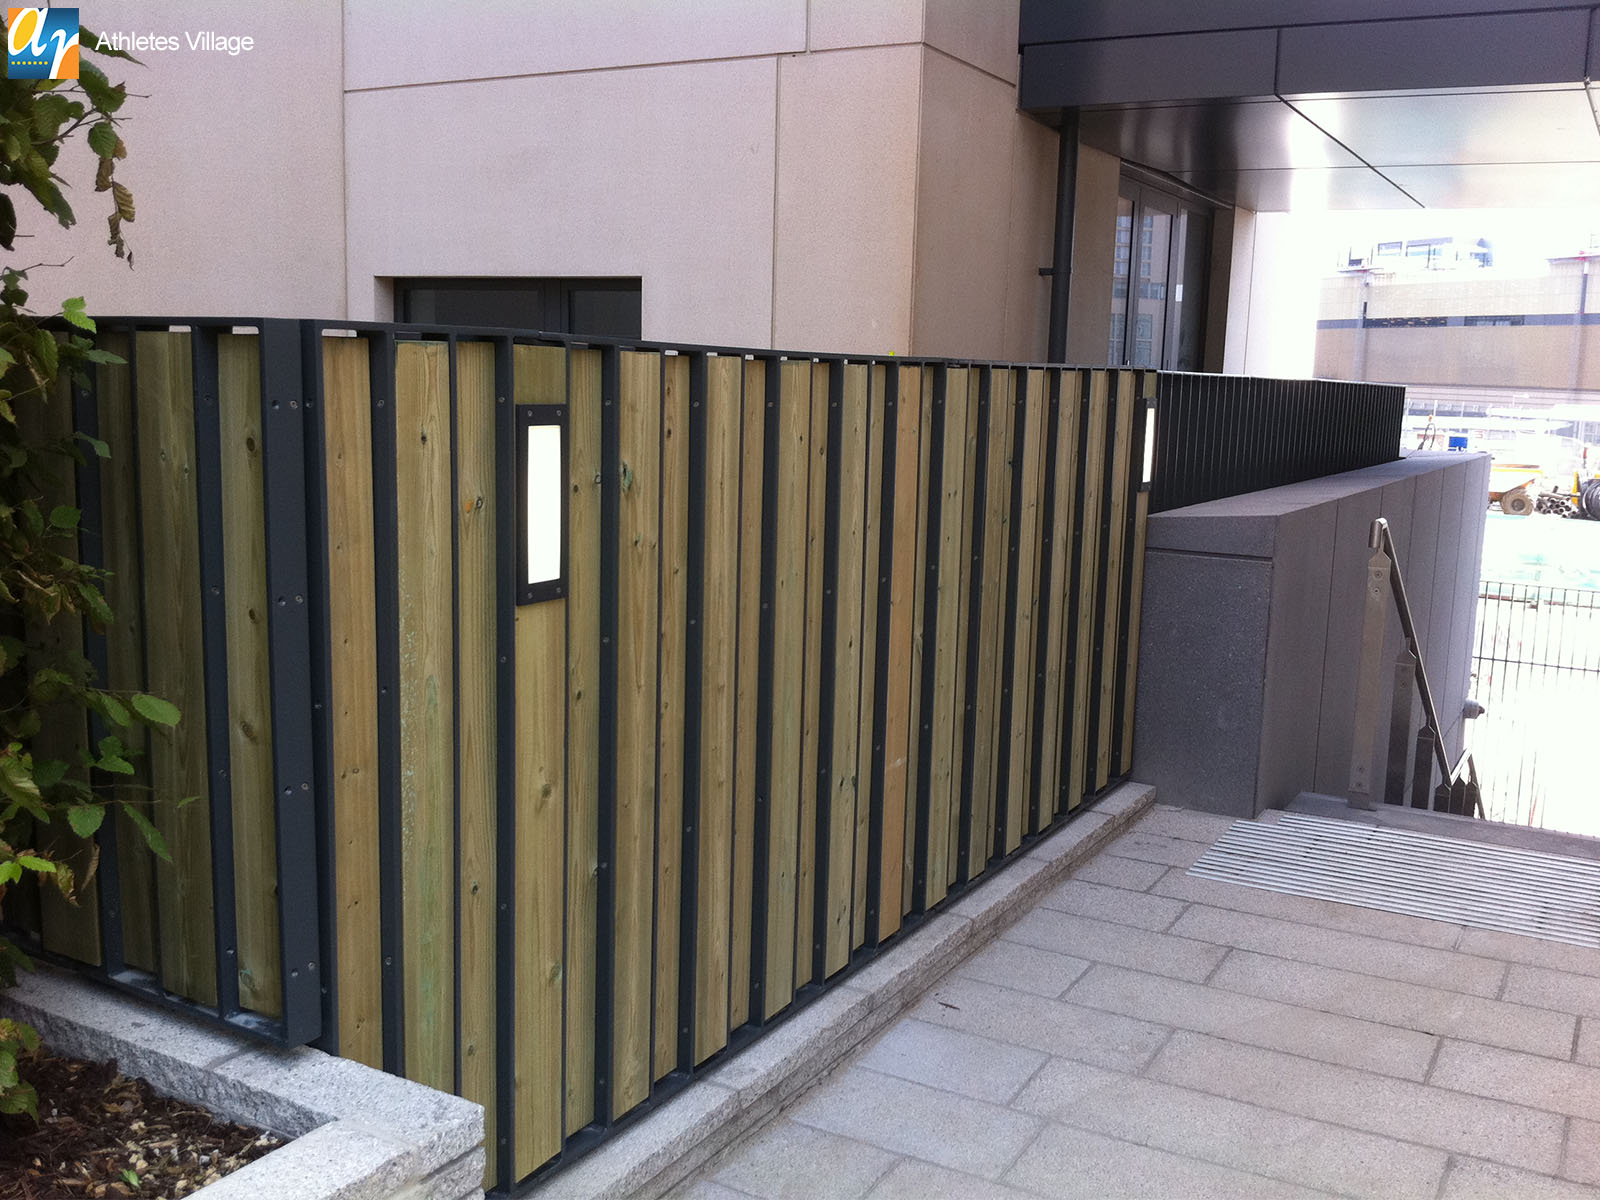 Athletes Village flat bar infill metal railings